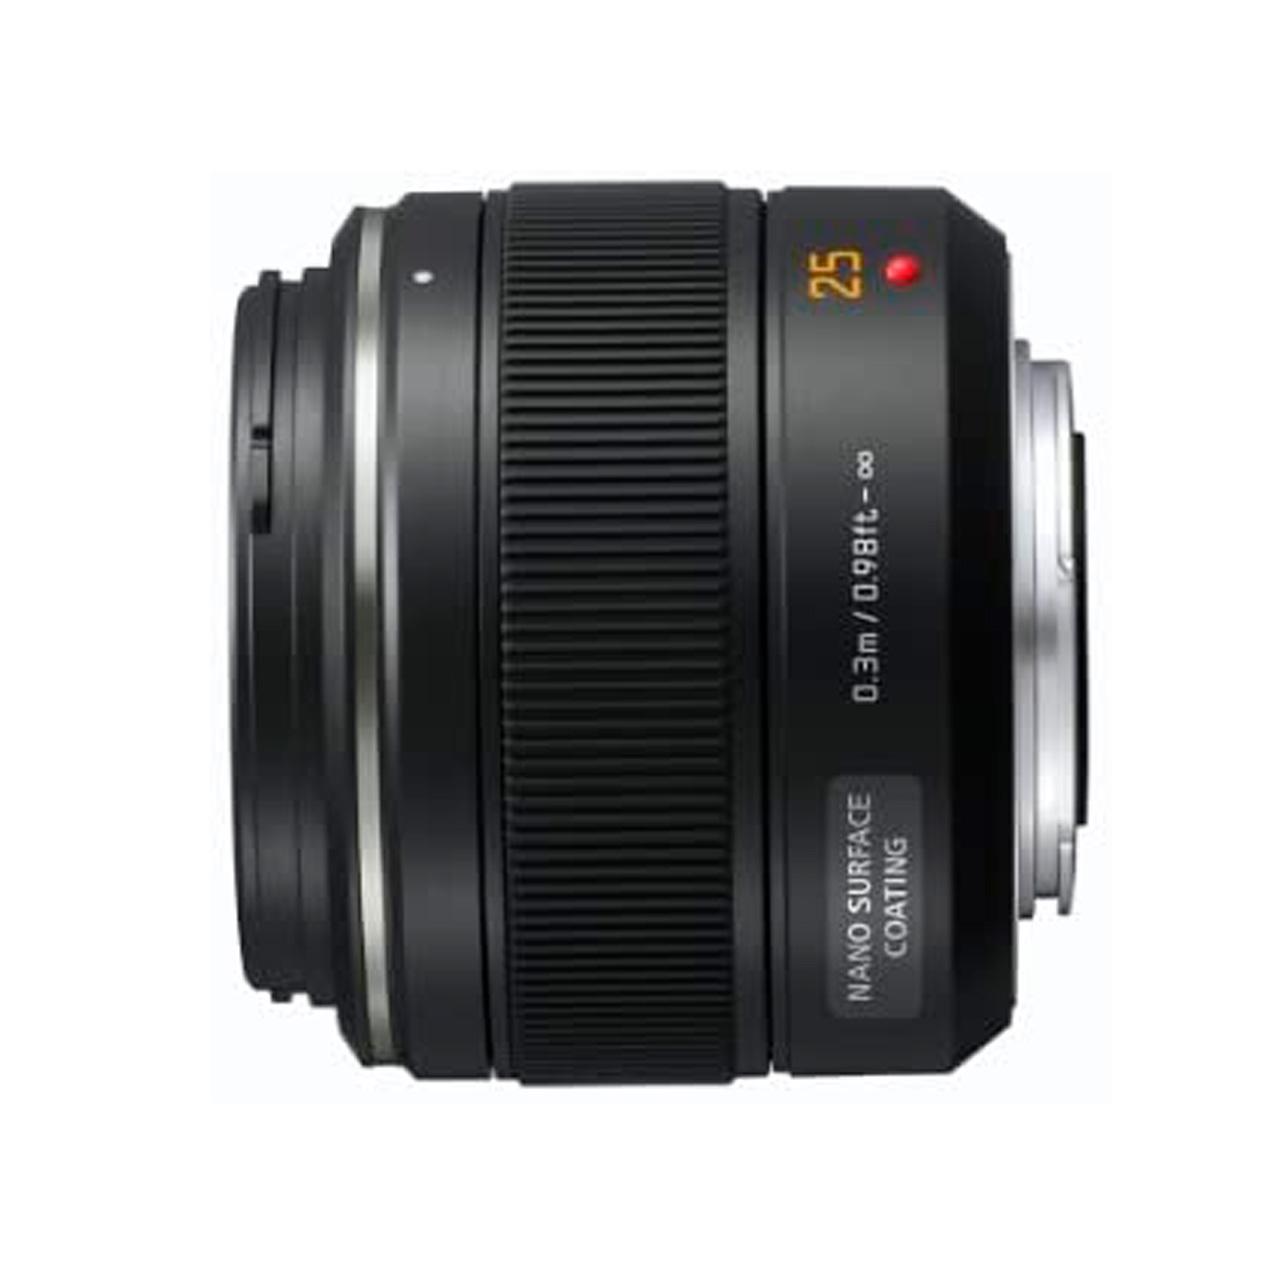 Panasonic Objetivo 25mm f/1.4 46mm Leica (Nuevo)